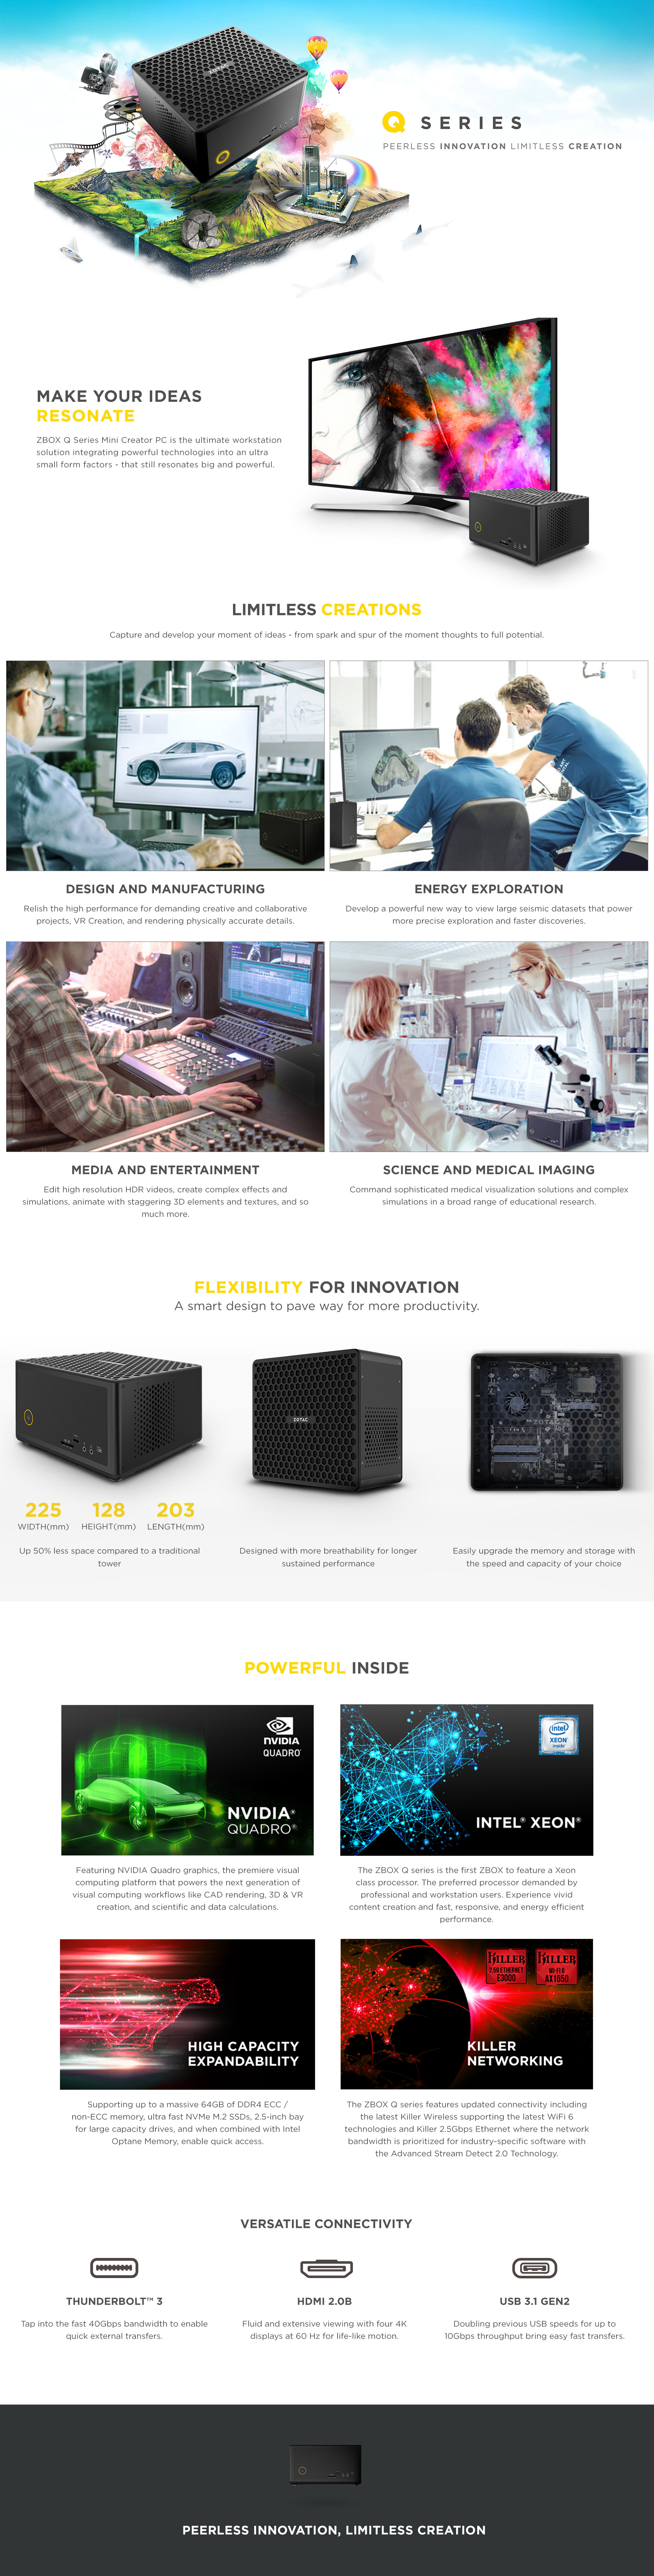 ZBOX QX3P5000 (Barebone) | ZOTAC